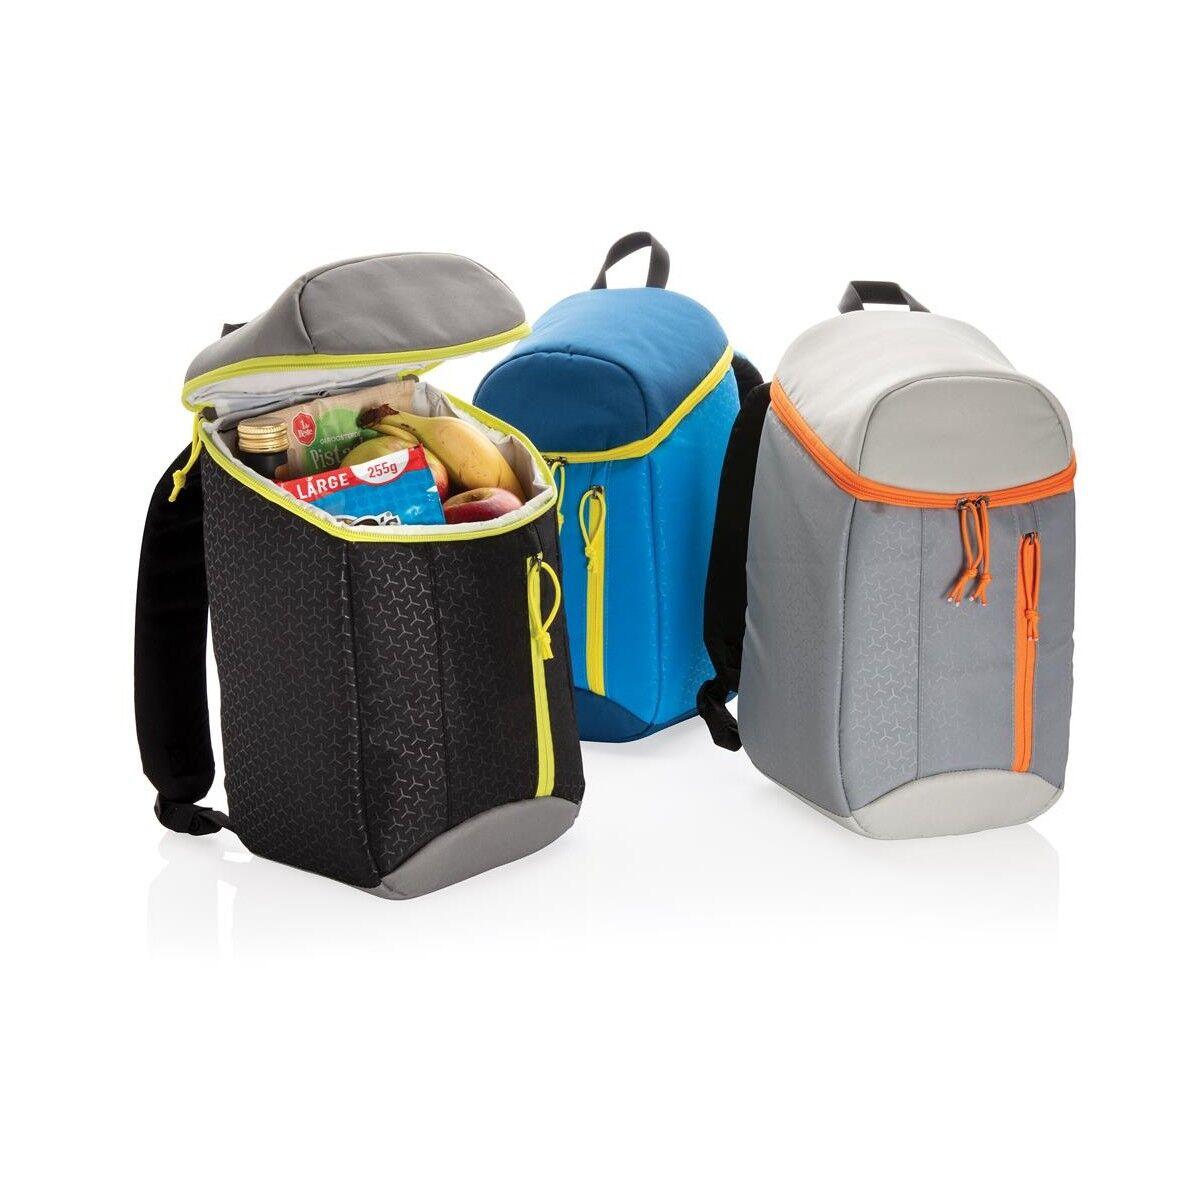 Outdoor Cooler Backpack 10 Litre